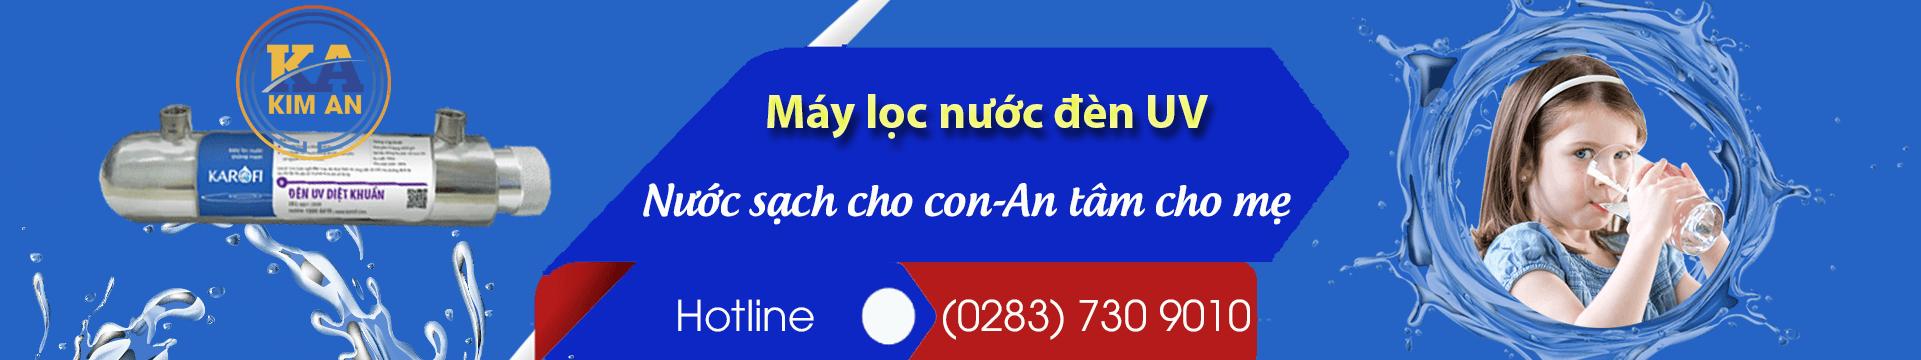 may loc nuoc den uv 1 1